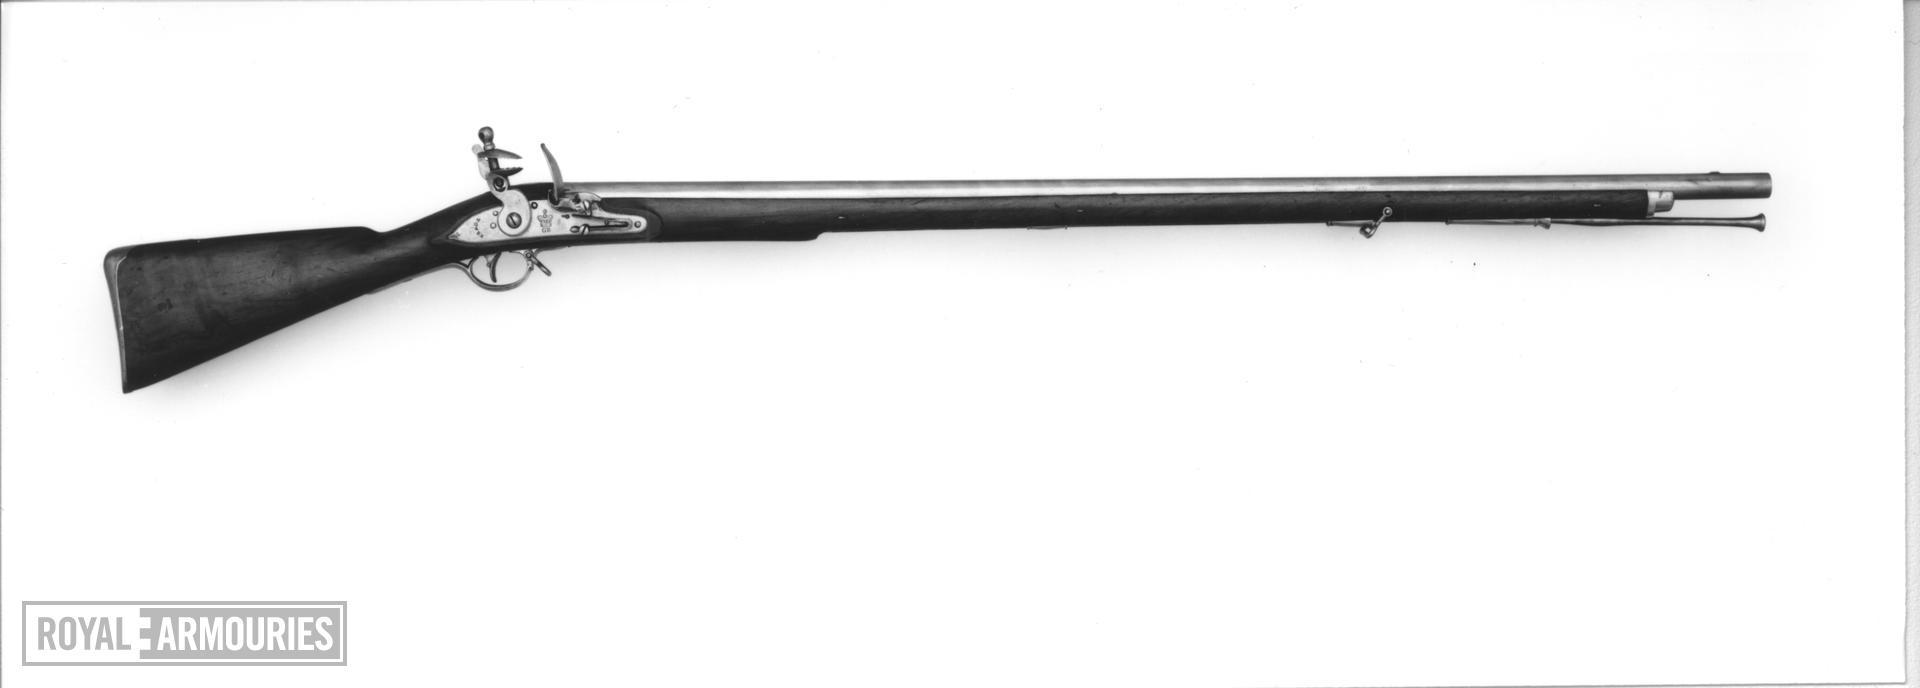 Flintlock military musket - New Land Pattern